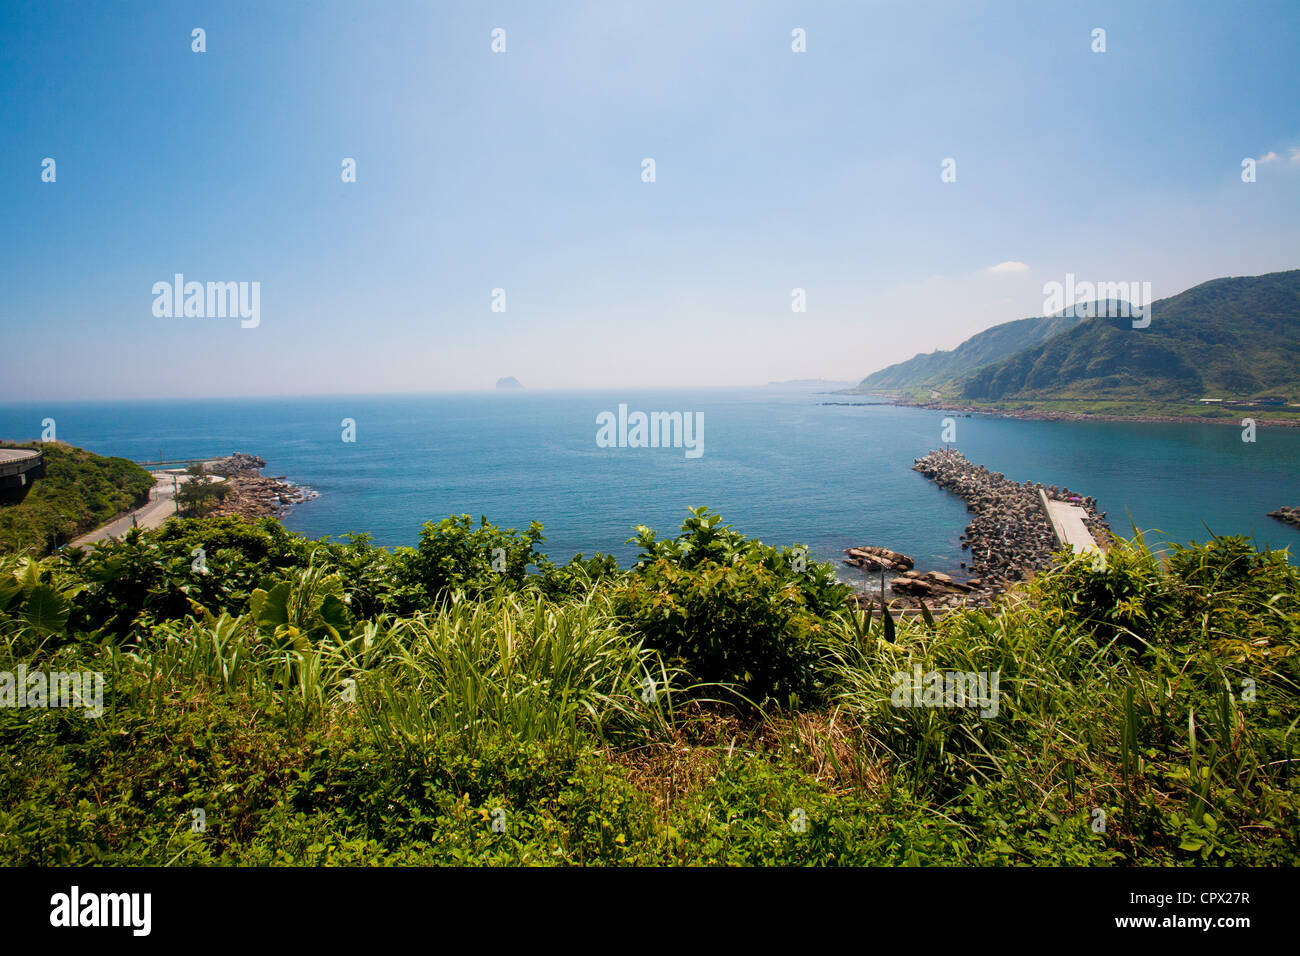 Beach at Yehliu Geopark, Wanli, Taiwan - Stock Image